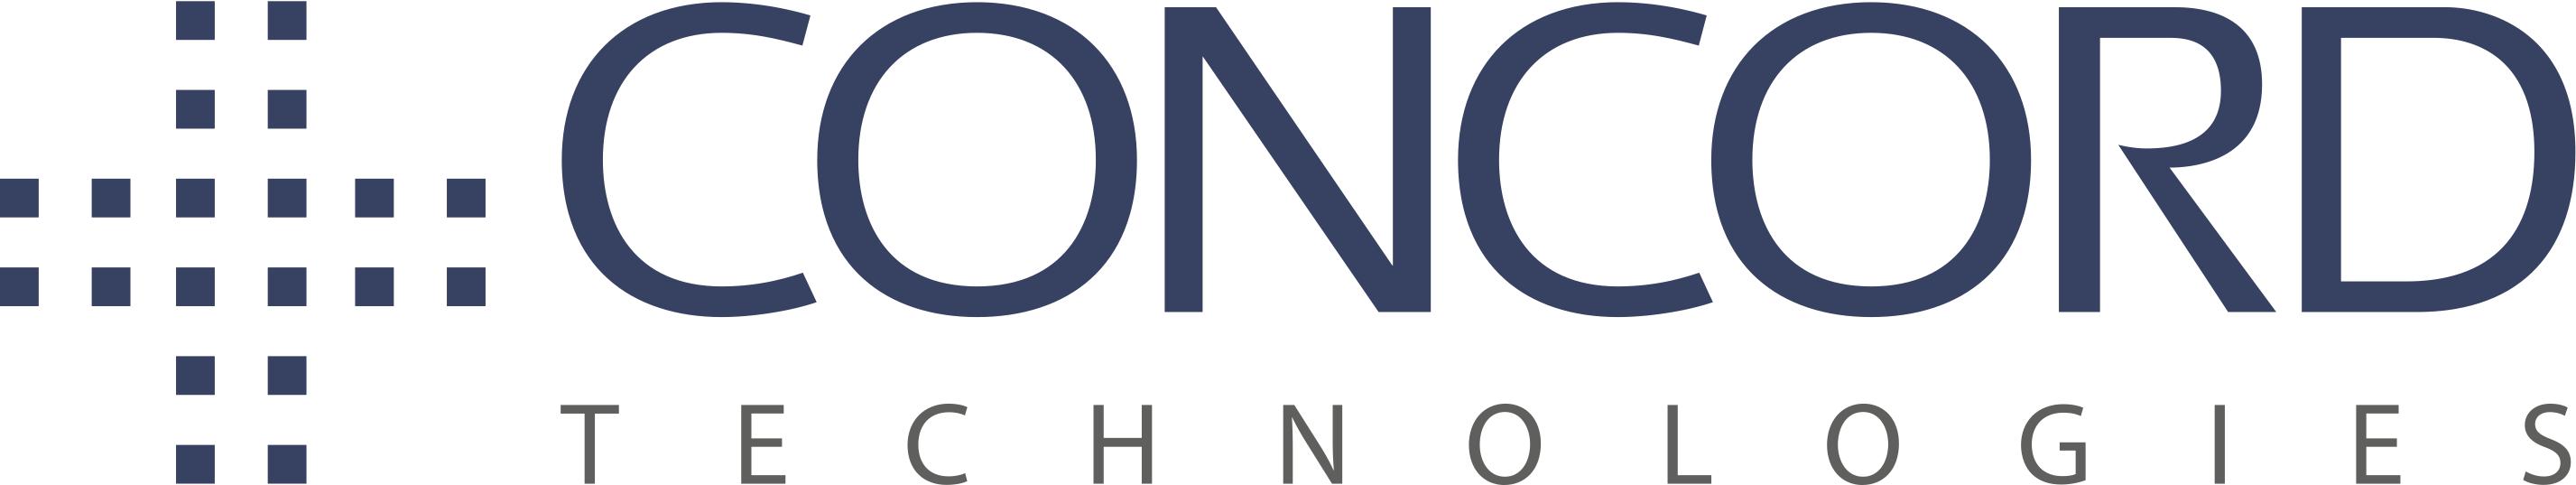 Concord-Technologies-BL-GR-Final